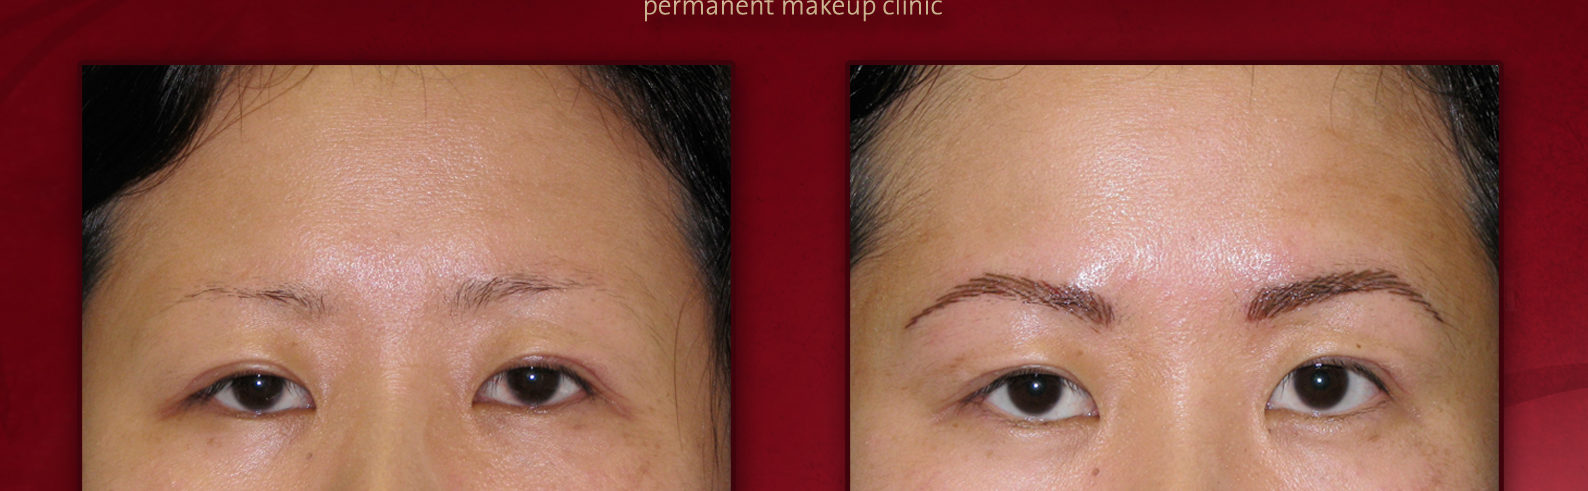 microblade eyebrows, eyebrow tattoo, permanent eyebrows, FeatherStroke Eyebrows